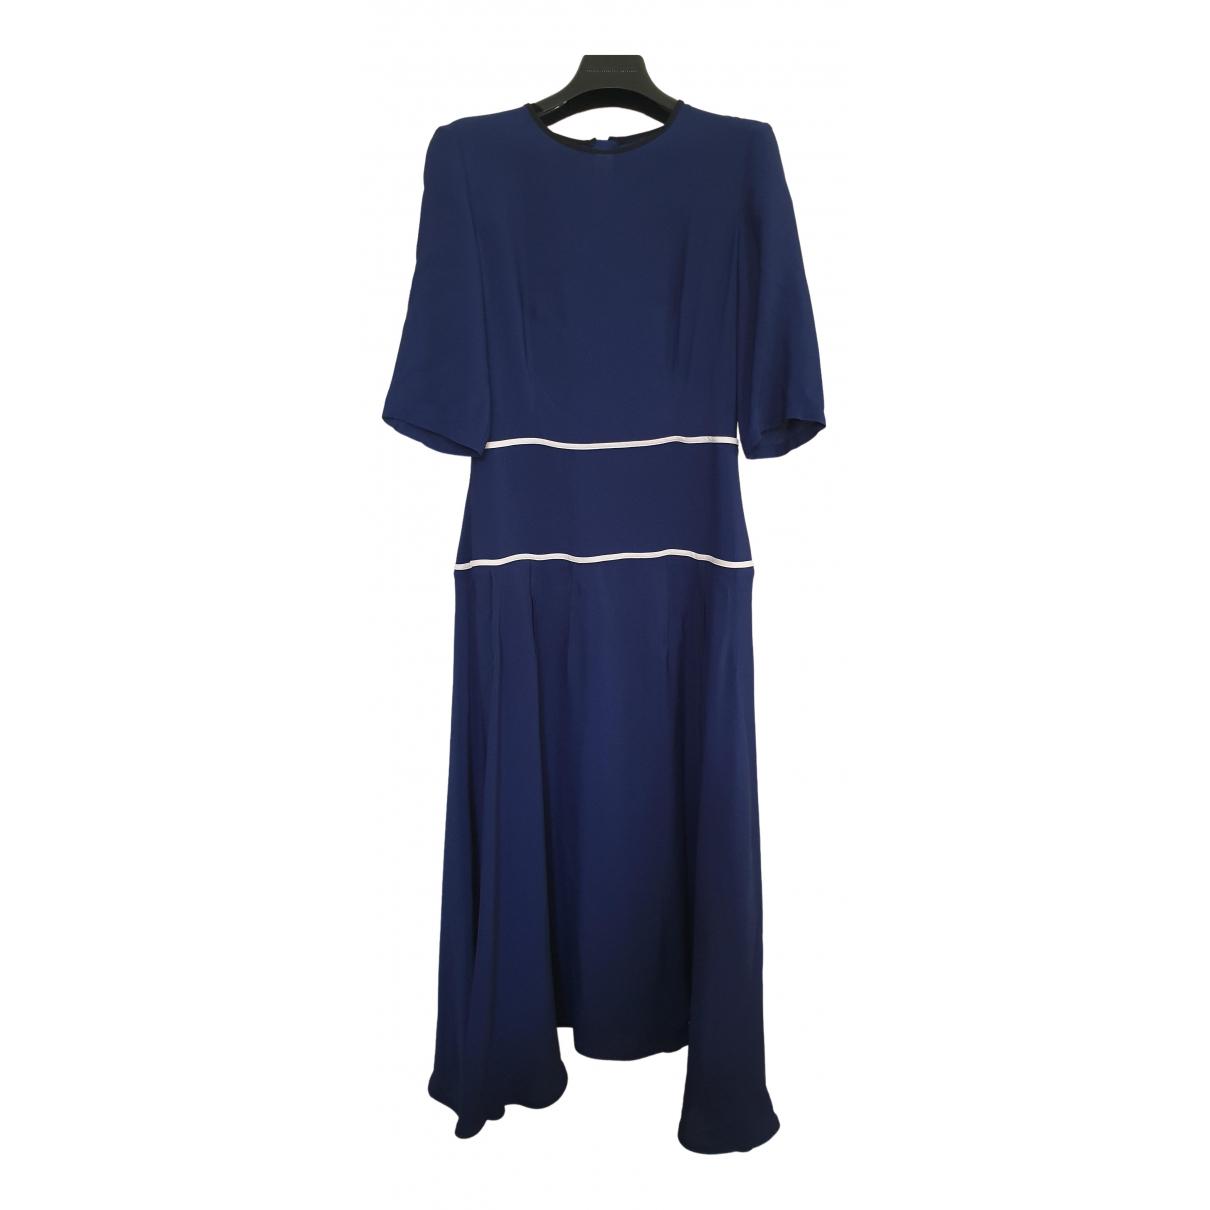 Marni - Robe   pour femme en soie - bleu